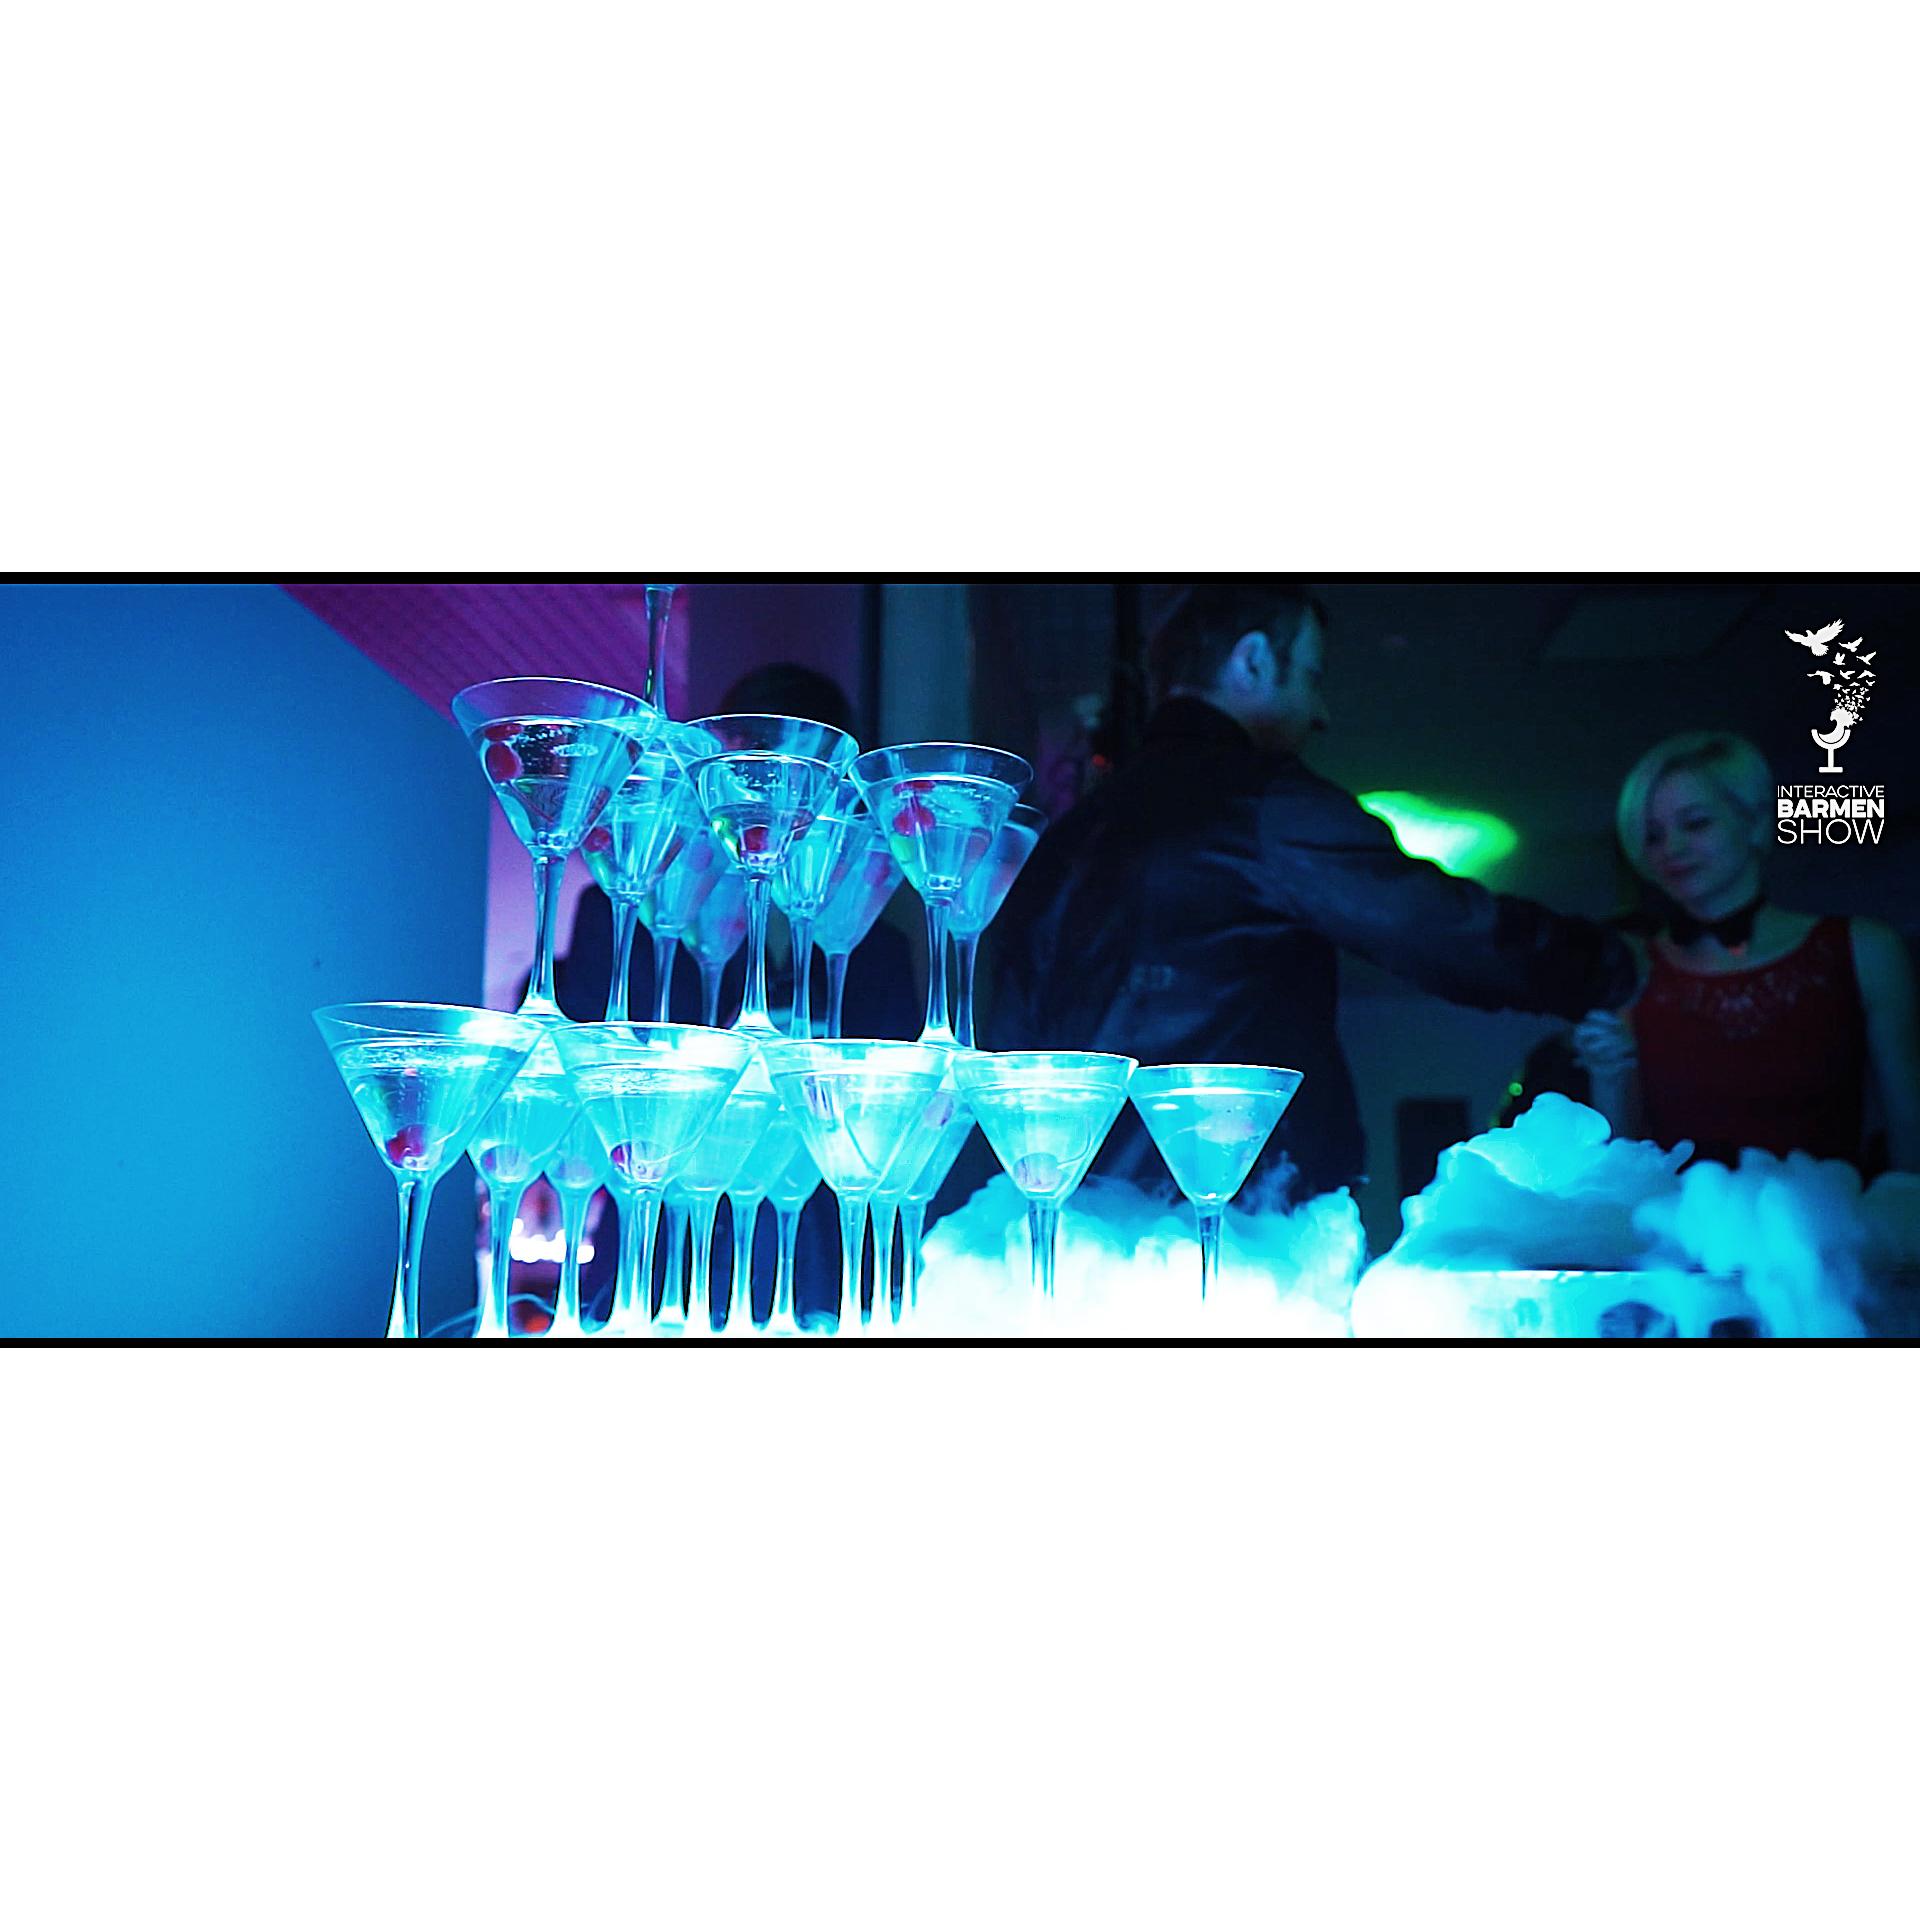 Interactive Barmen Show в Перми